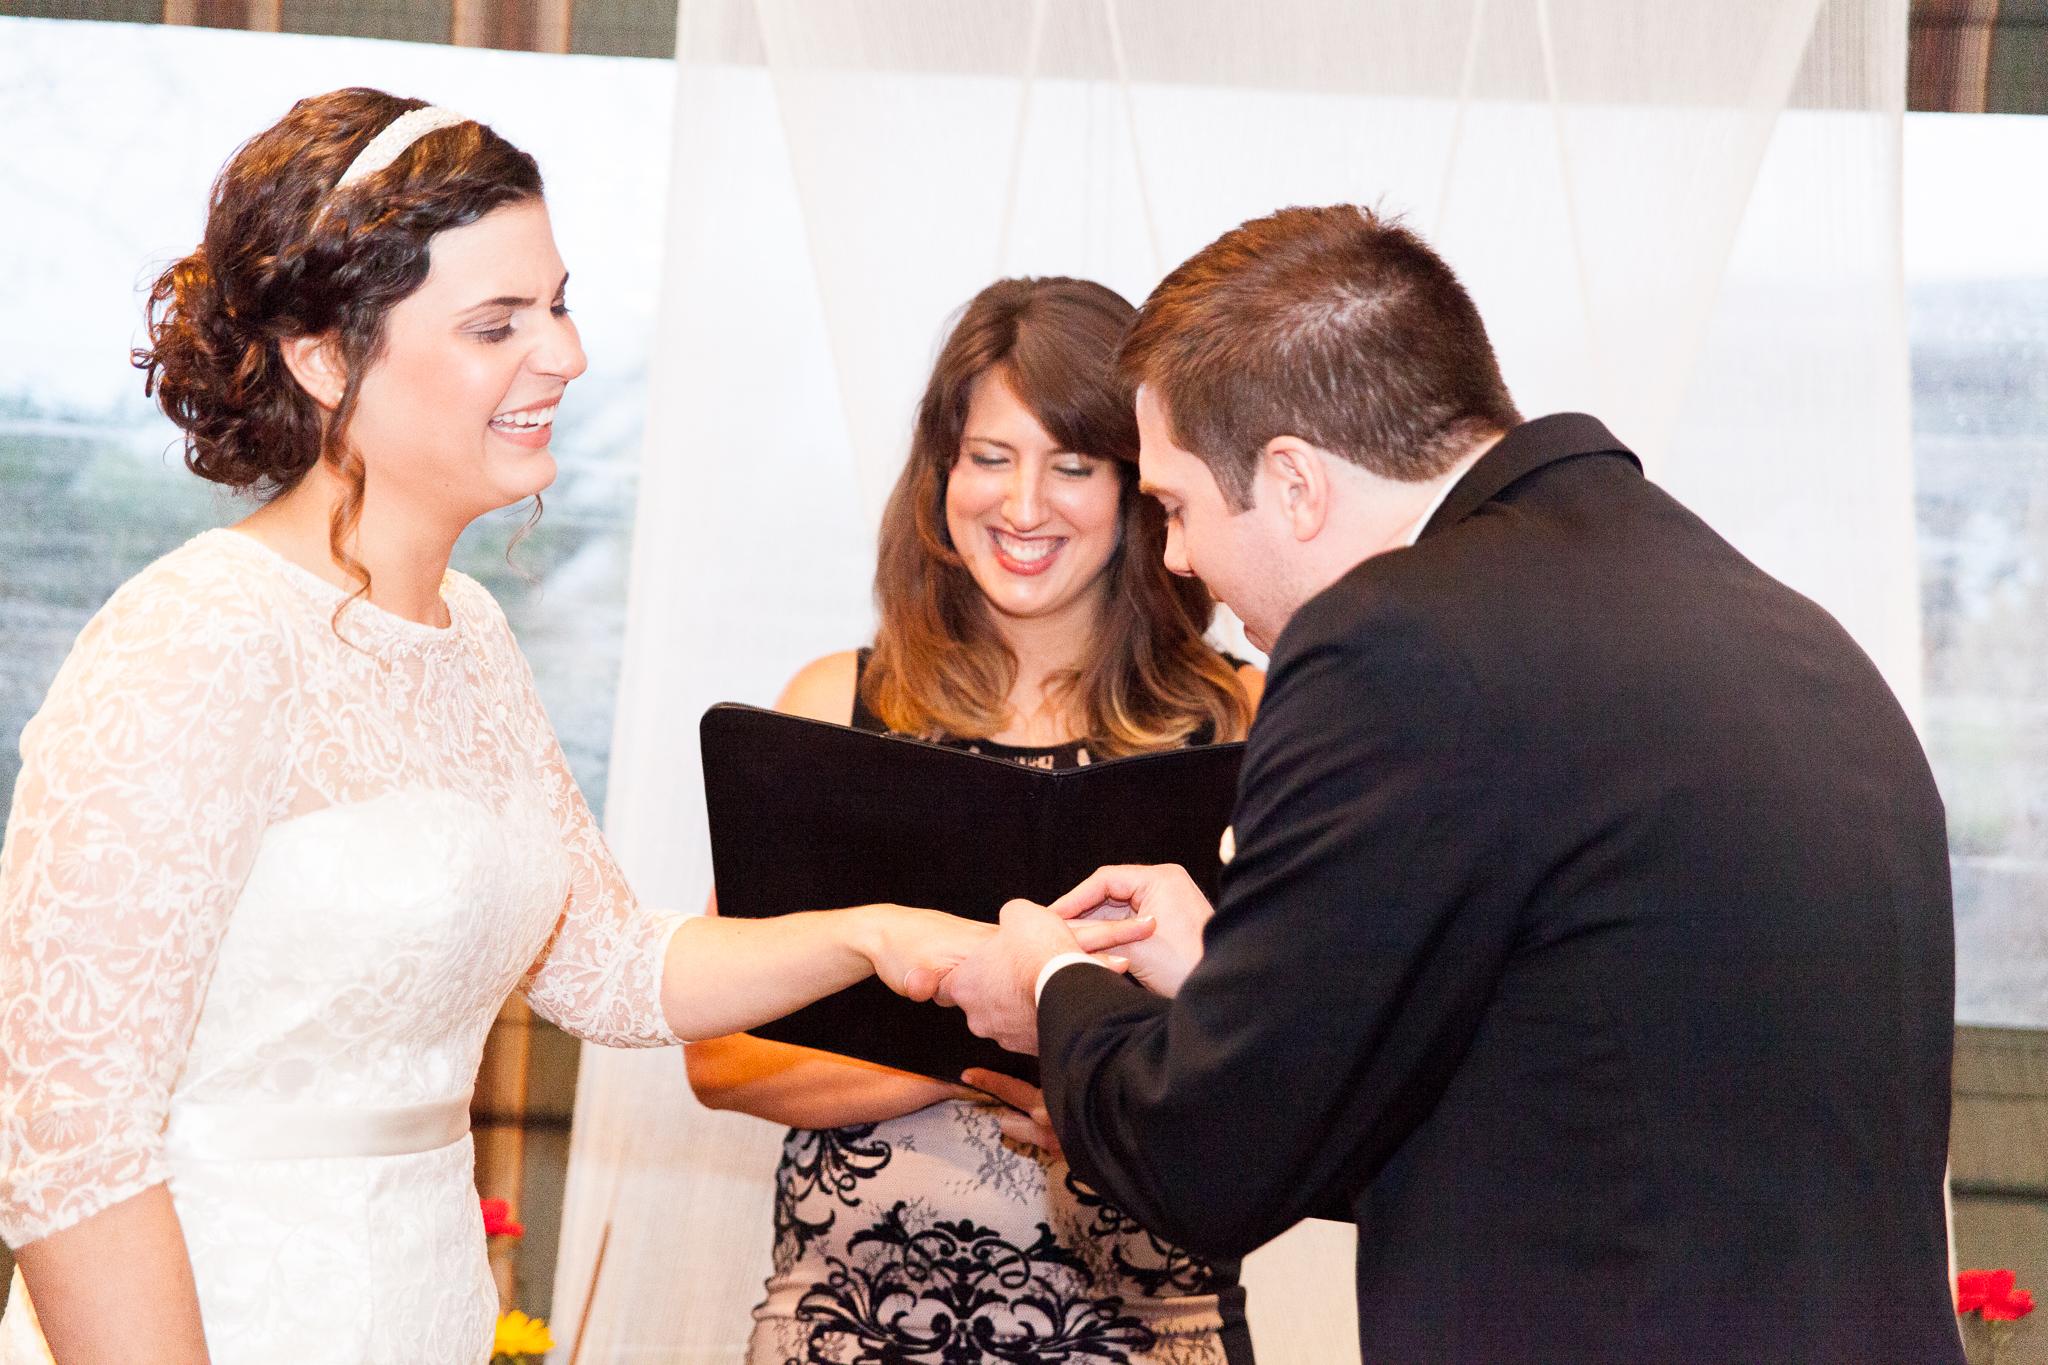 camuglia-whomstudio-chelsea_and_andy-nycphotographer-wedding-brooklyn-buffalo-timberlodge-084-0623.jpg